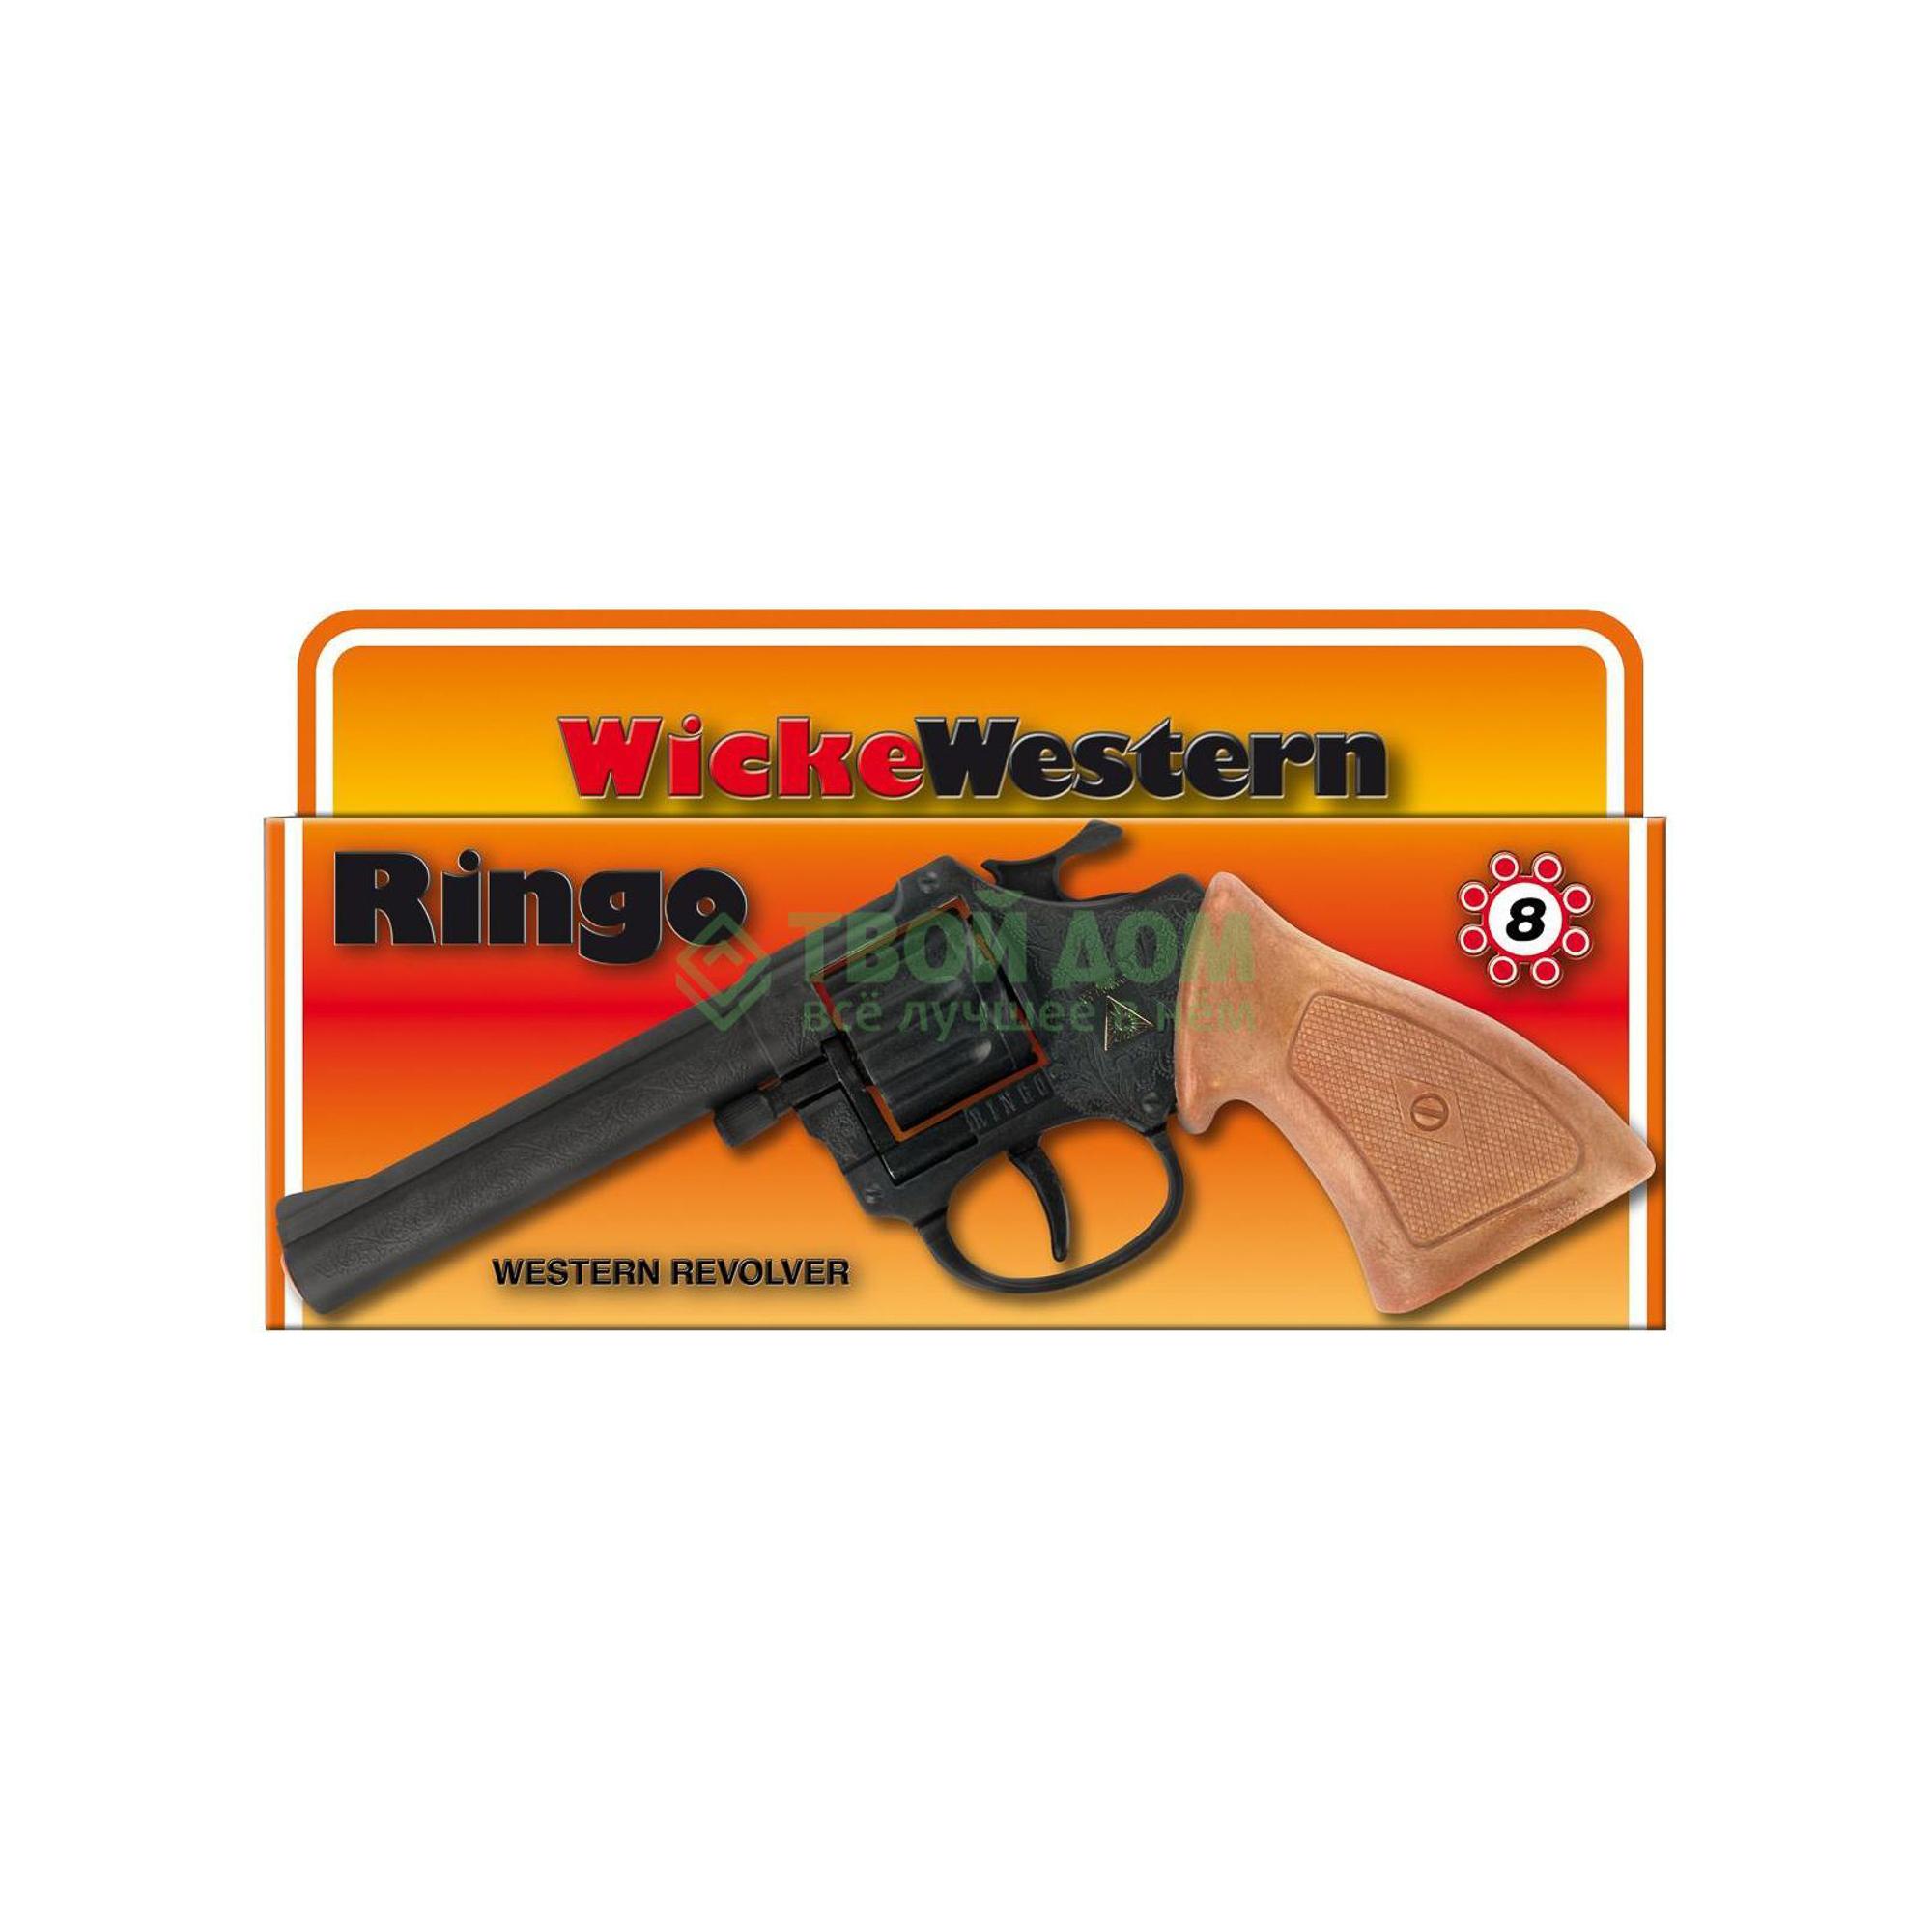 Фото - Бластер Sohni-wicke Пистолет ringo 8-зарядные gun игрушечное оружие sohni wicke пистолет texas rapido 8 зарядные gun western 214mm